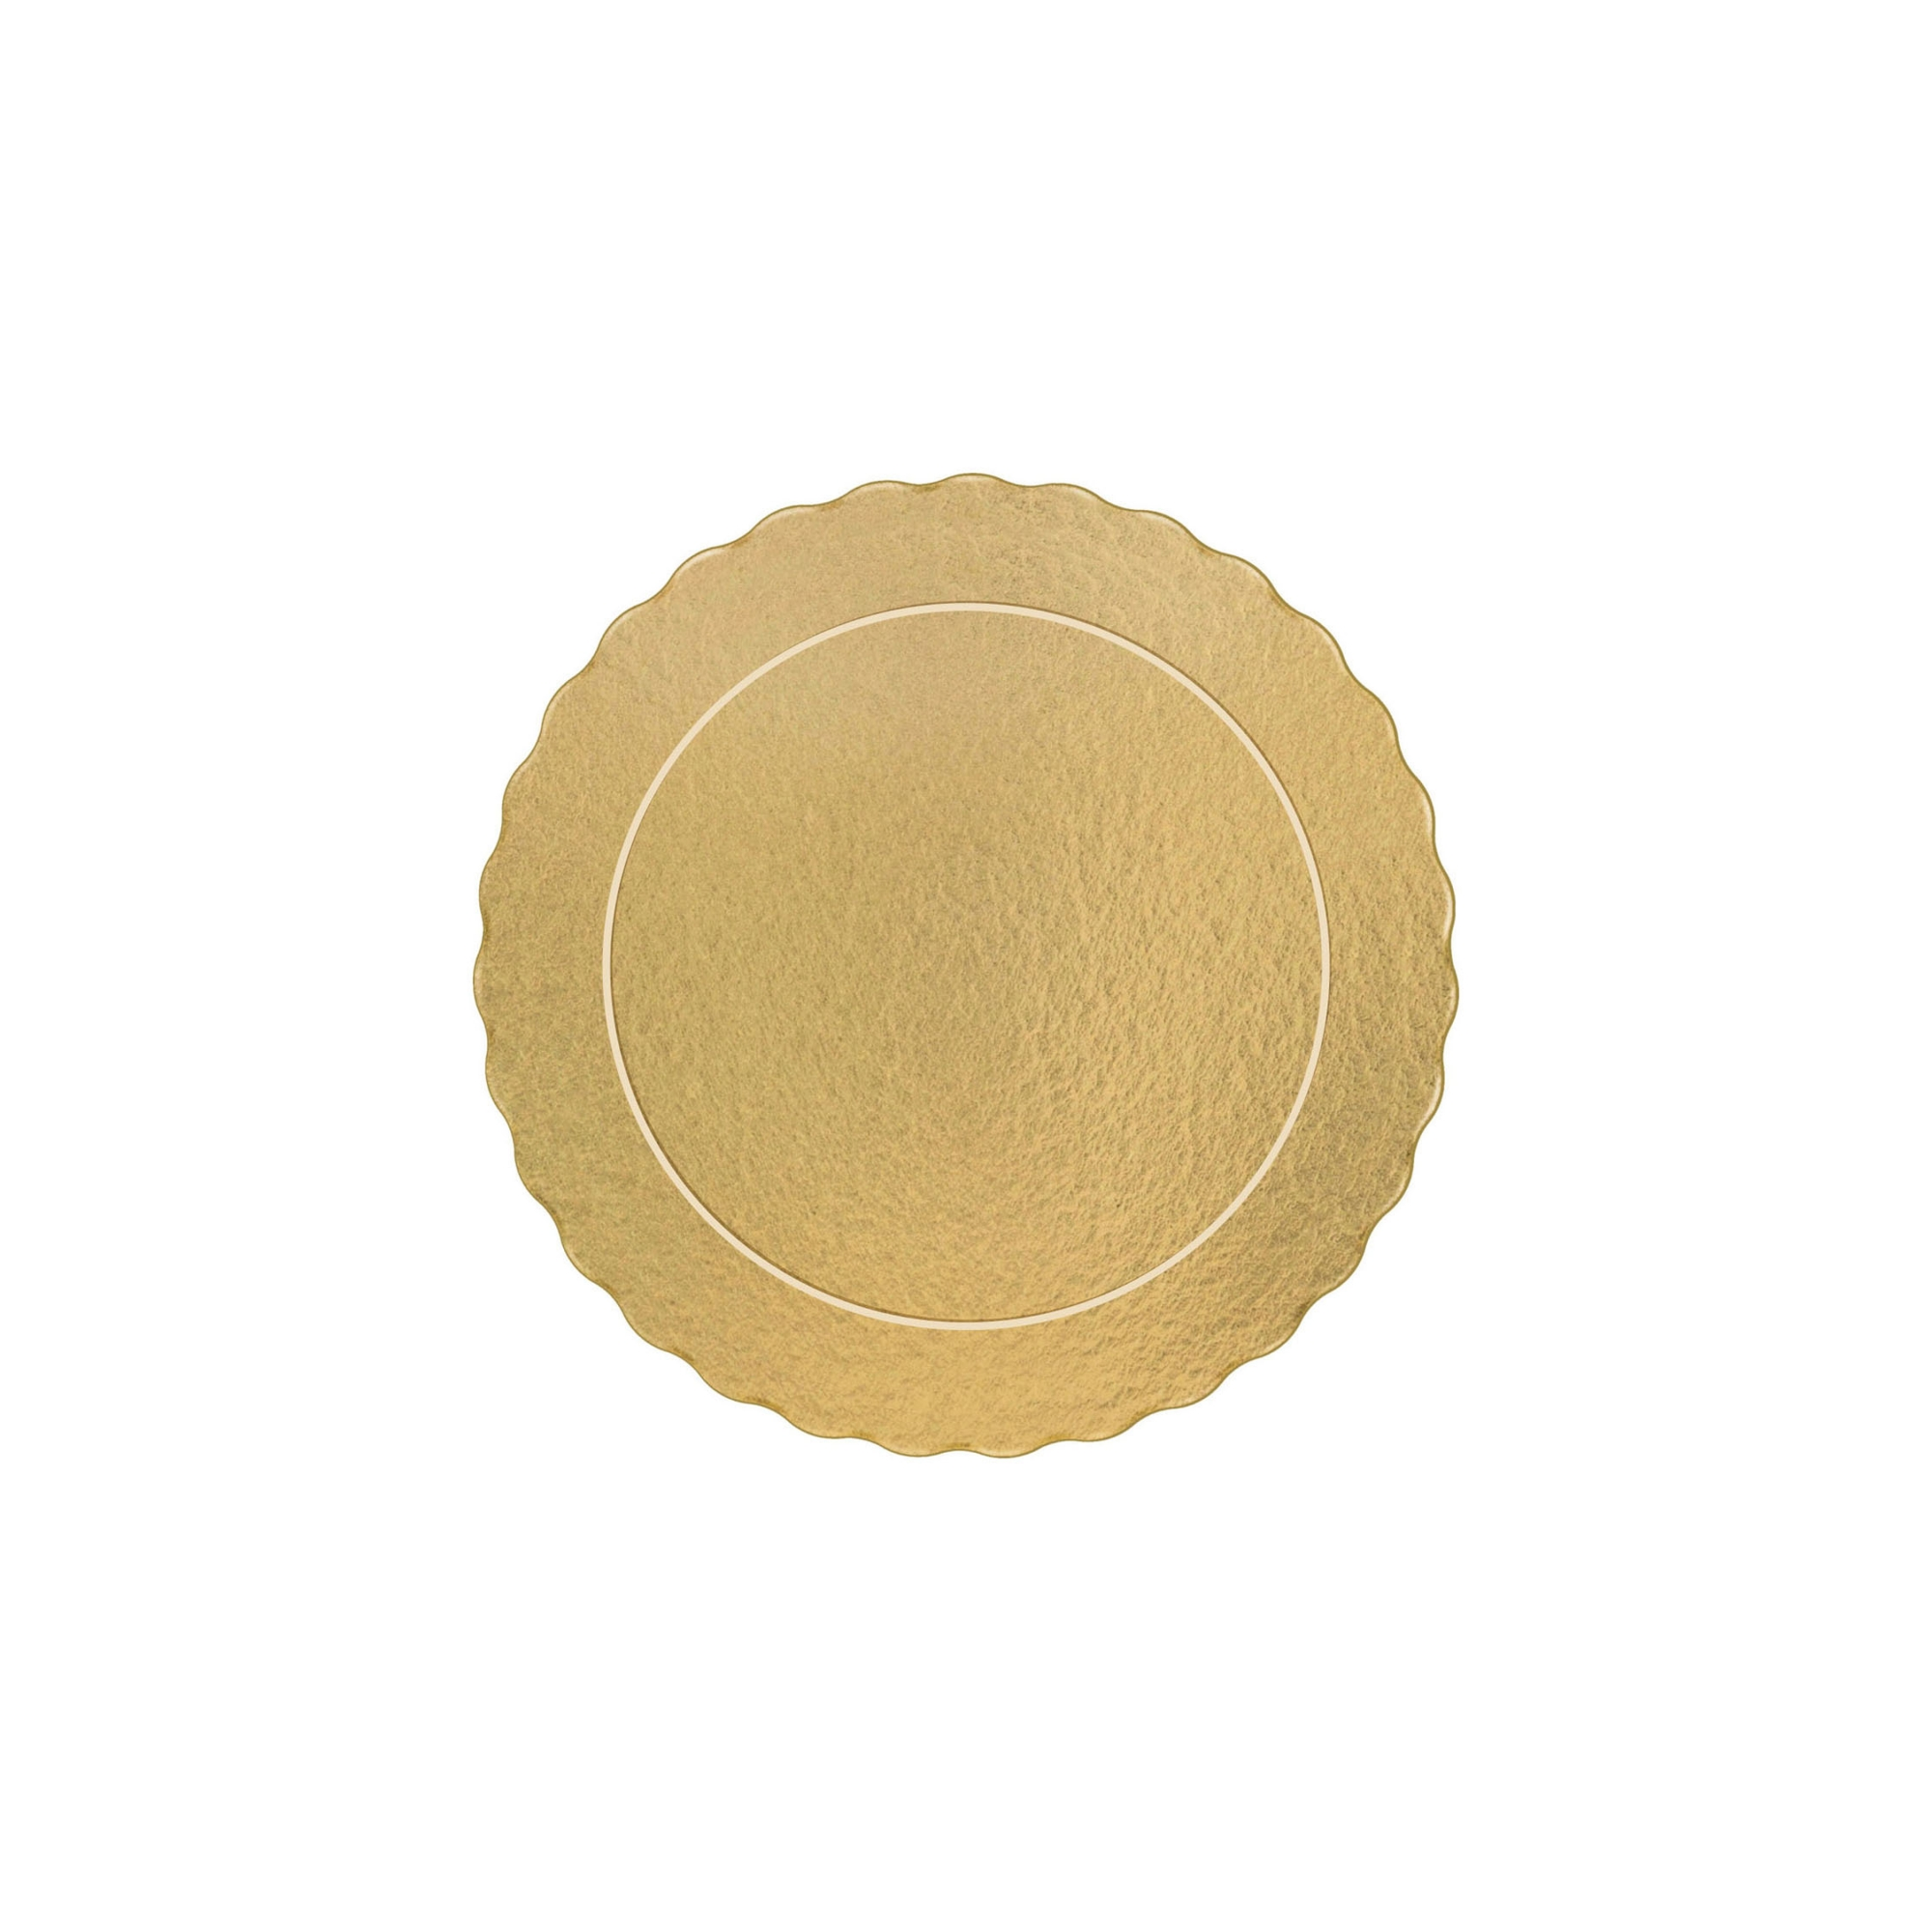 50 Bases Laminadas, Suporte P/ Bolo, 15cm - Ouro